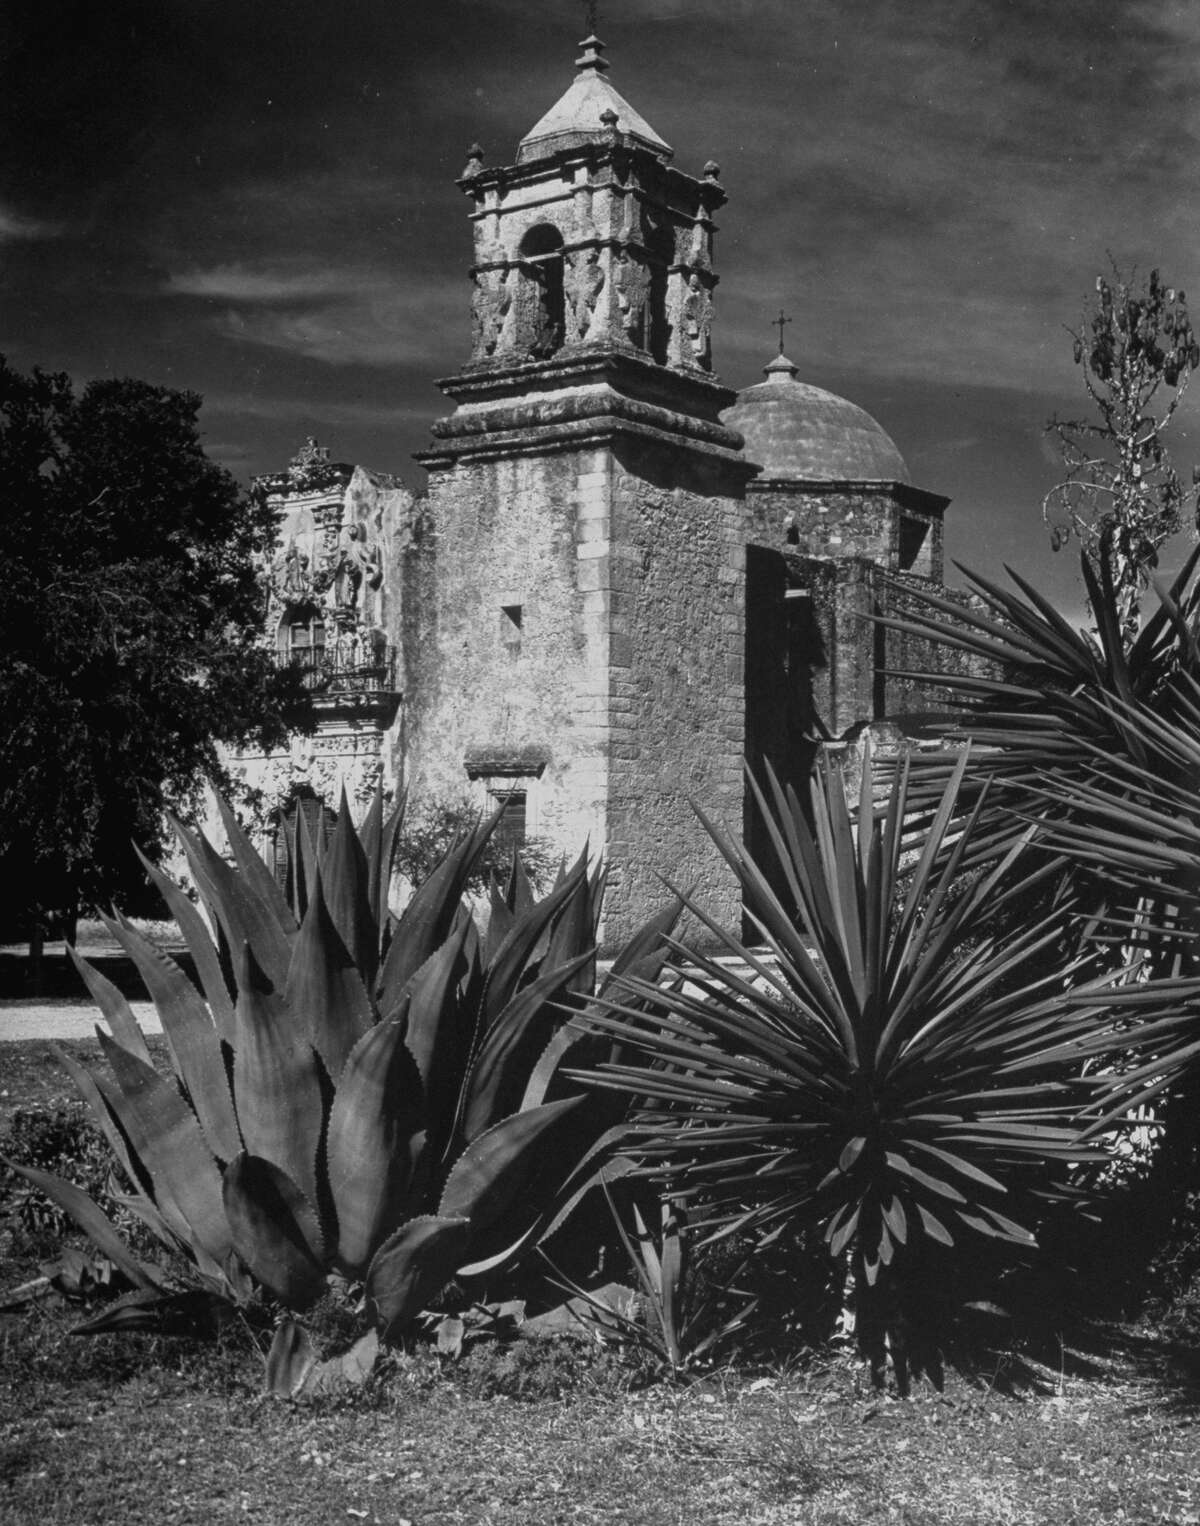 Cactus growing around Mission San José on Dec. 31, 1944.